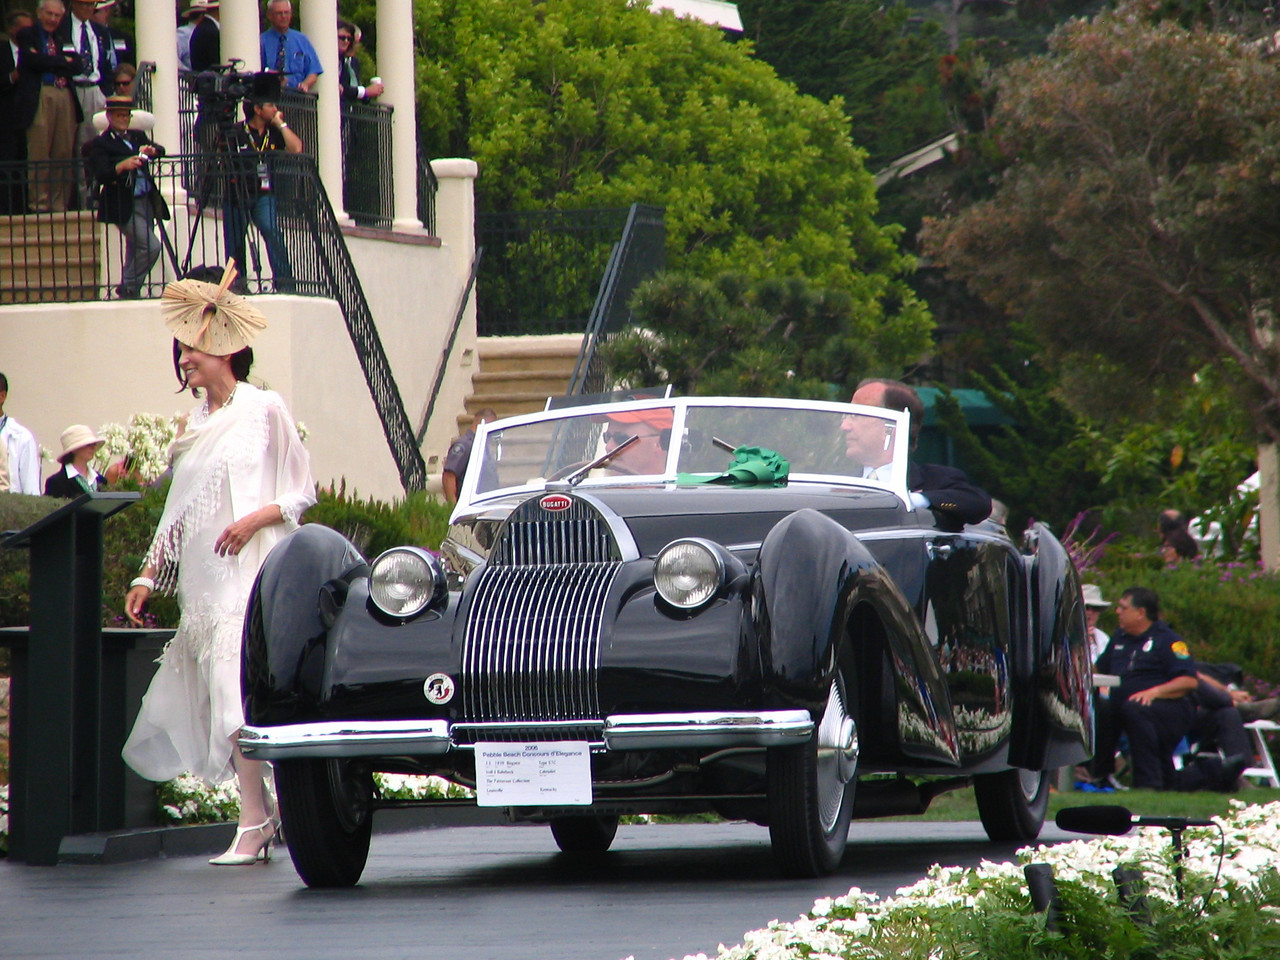 Gwenn Graham Most Elegant Convertible Car Trophy Winner -- 1939 Bugatti Type 57C Voll & Ruhrbeck Cabriolet